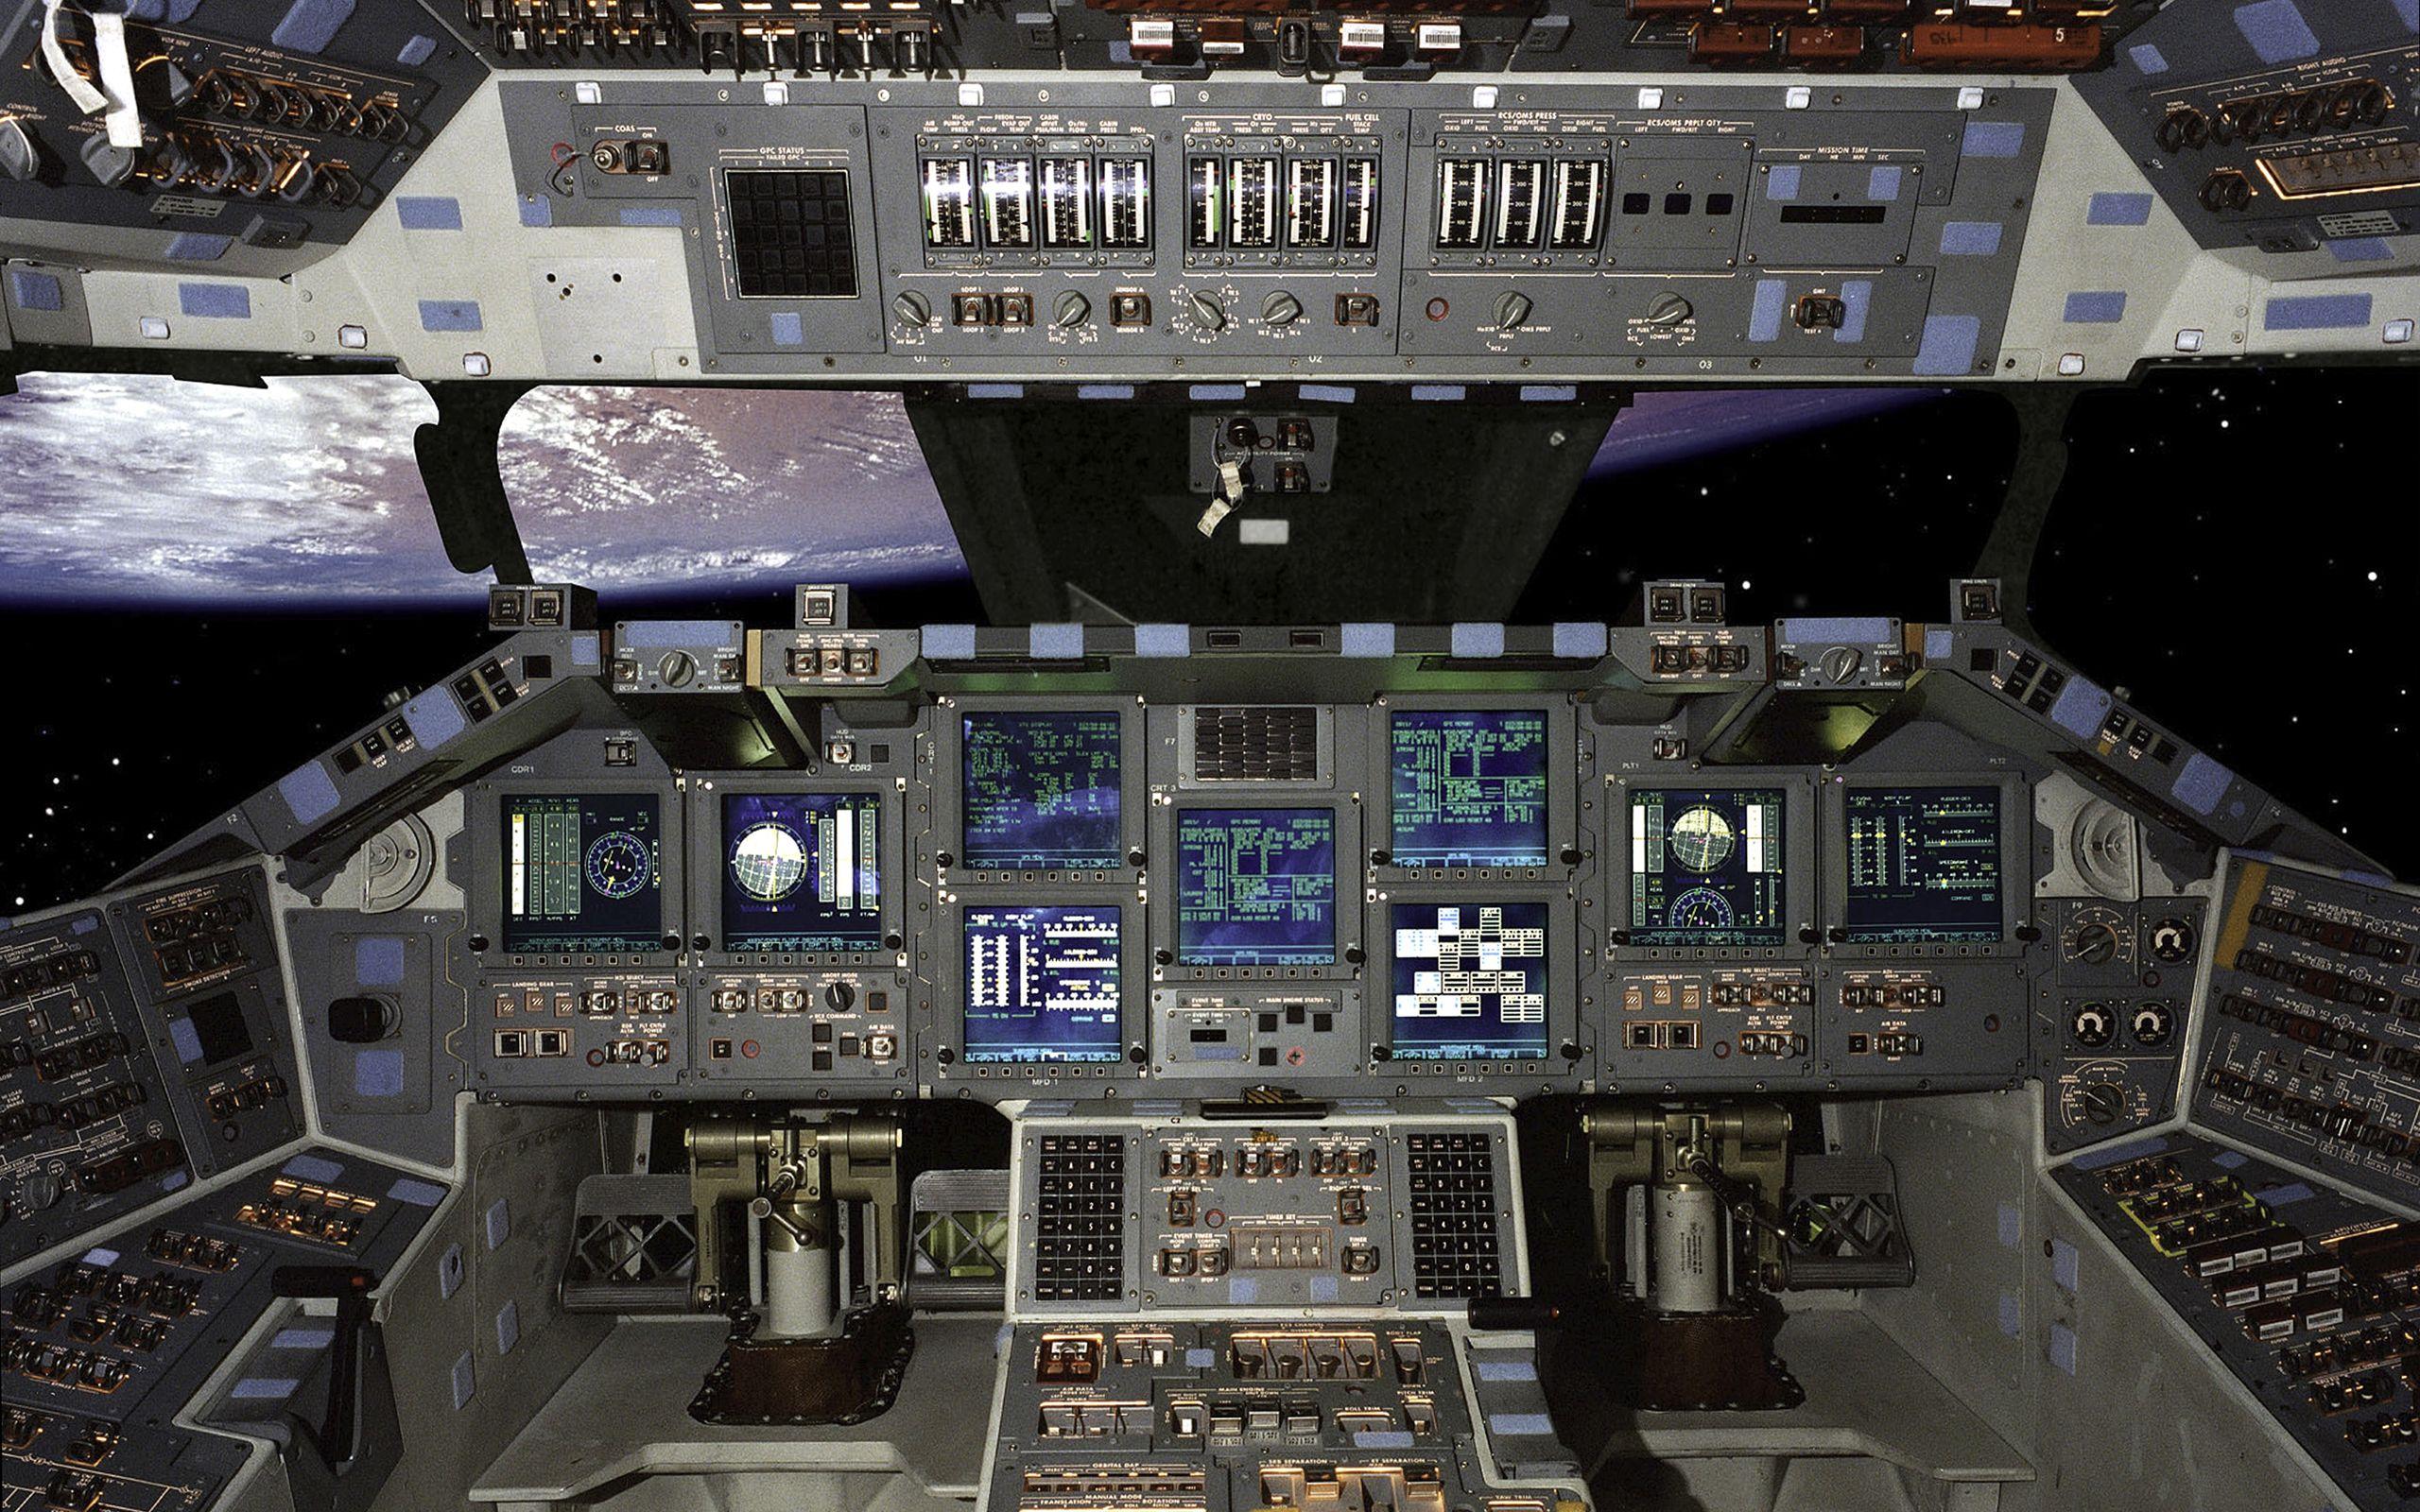 Displaying images for millenium falcon cockpit wallpaper - 381fea24dd5efdd1b87ace54719f27c6 Jpg